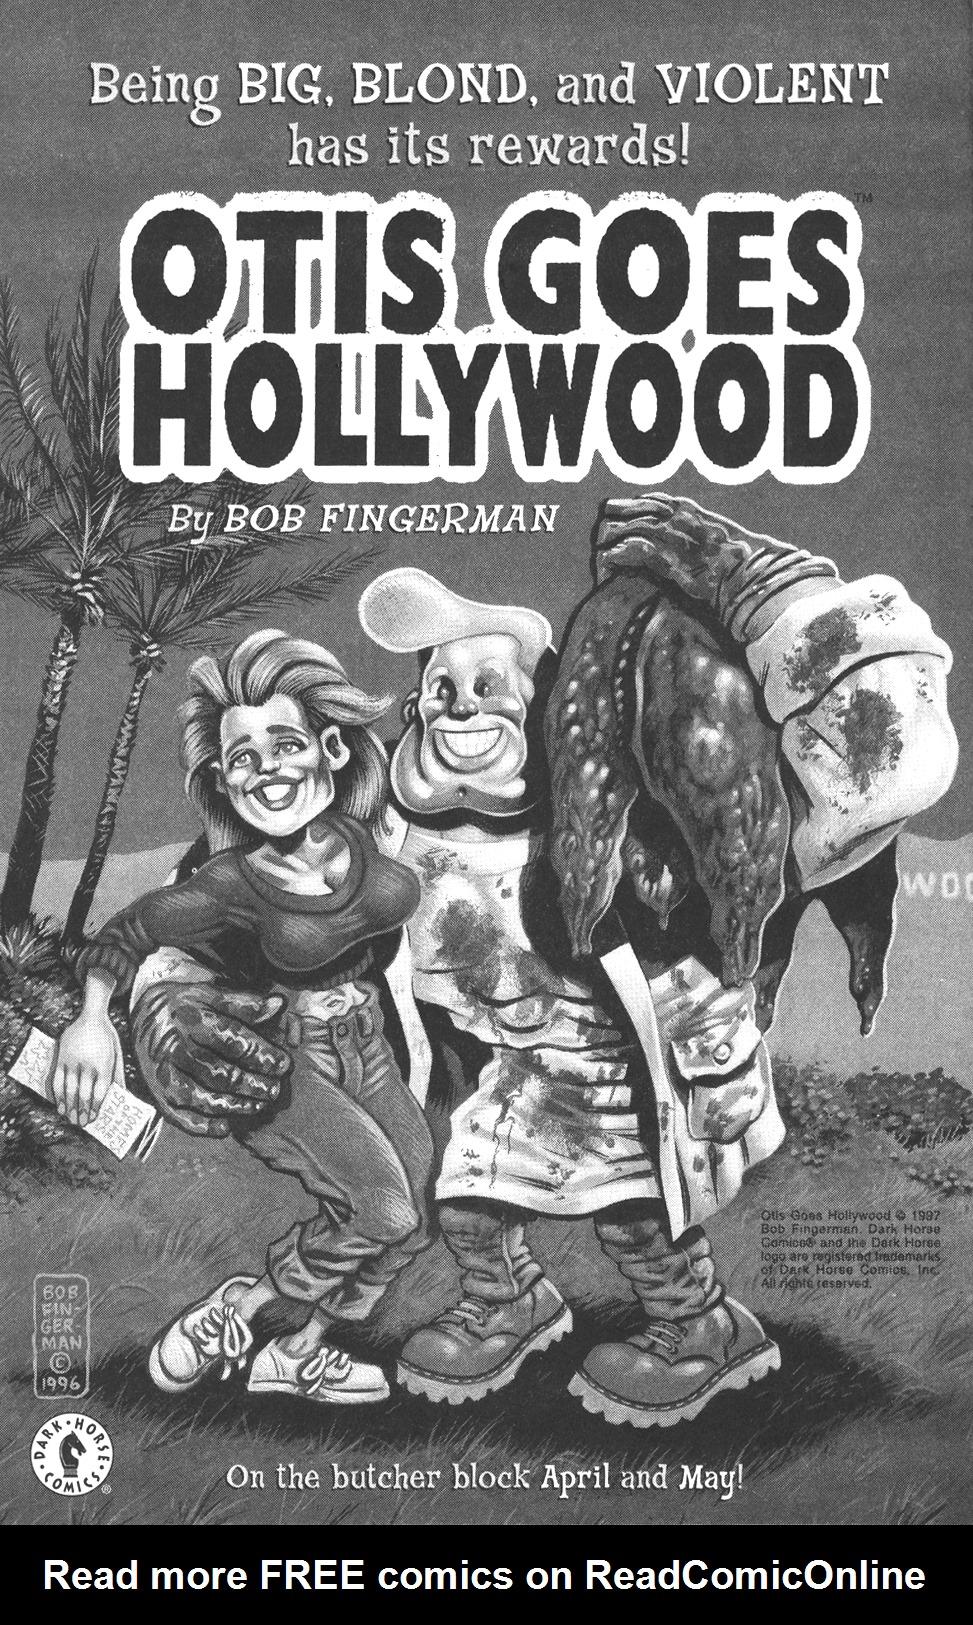 OTIS GOES HOLLYWOOD 1 2 Bob Fingerman